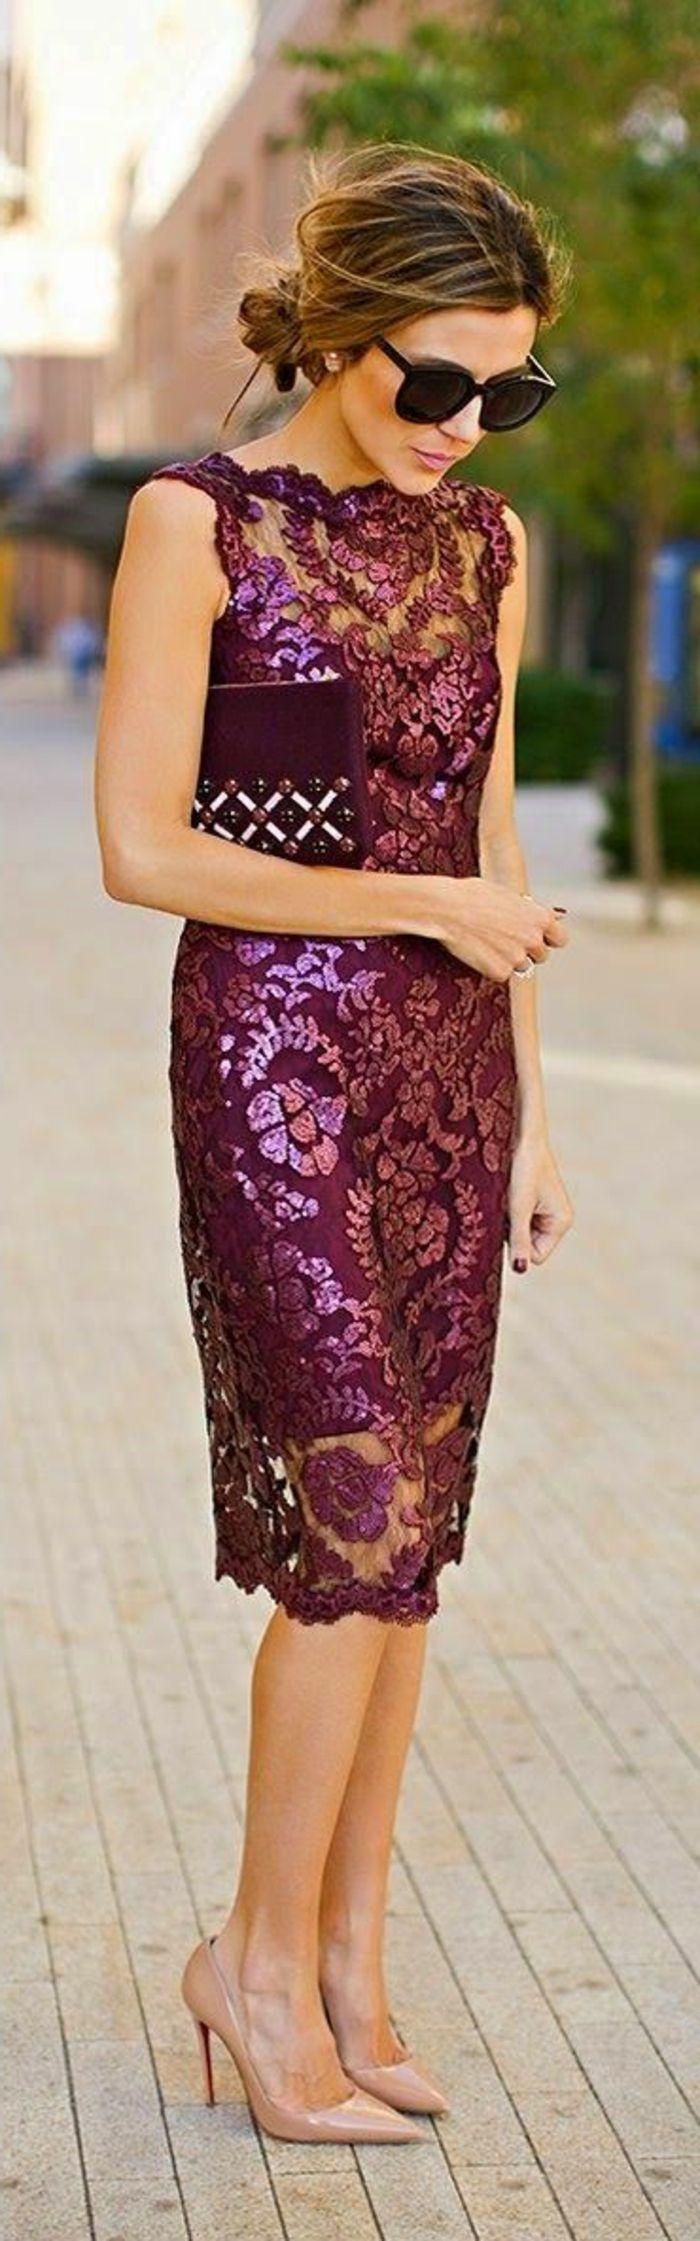 jolie robe habillee en dentelle violet et talons hauts